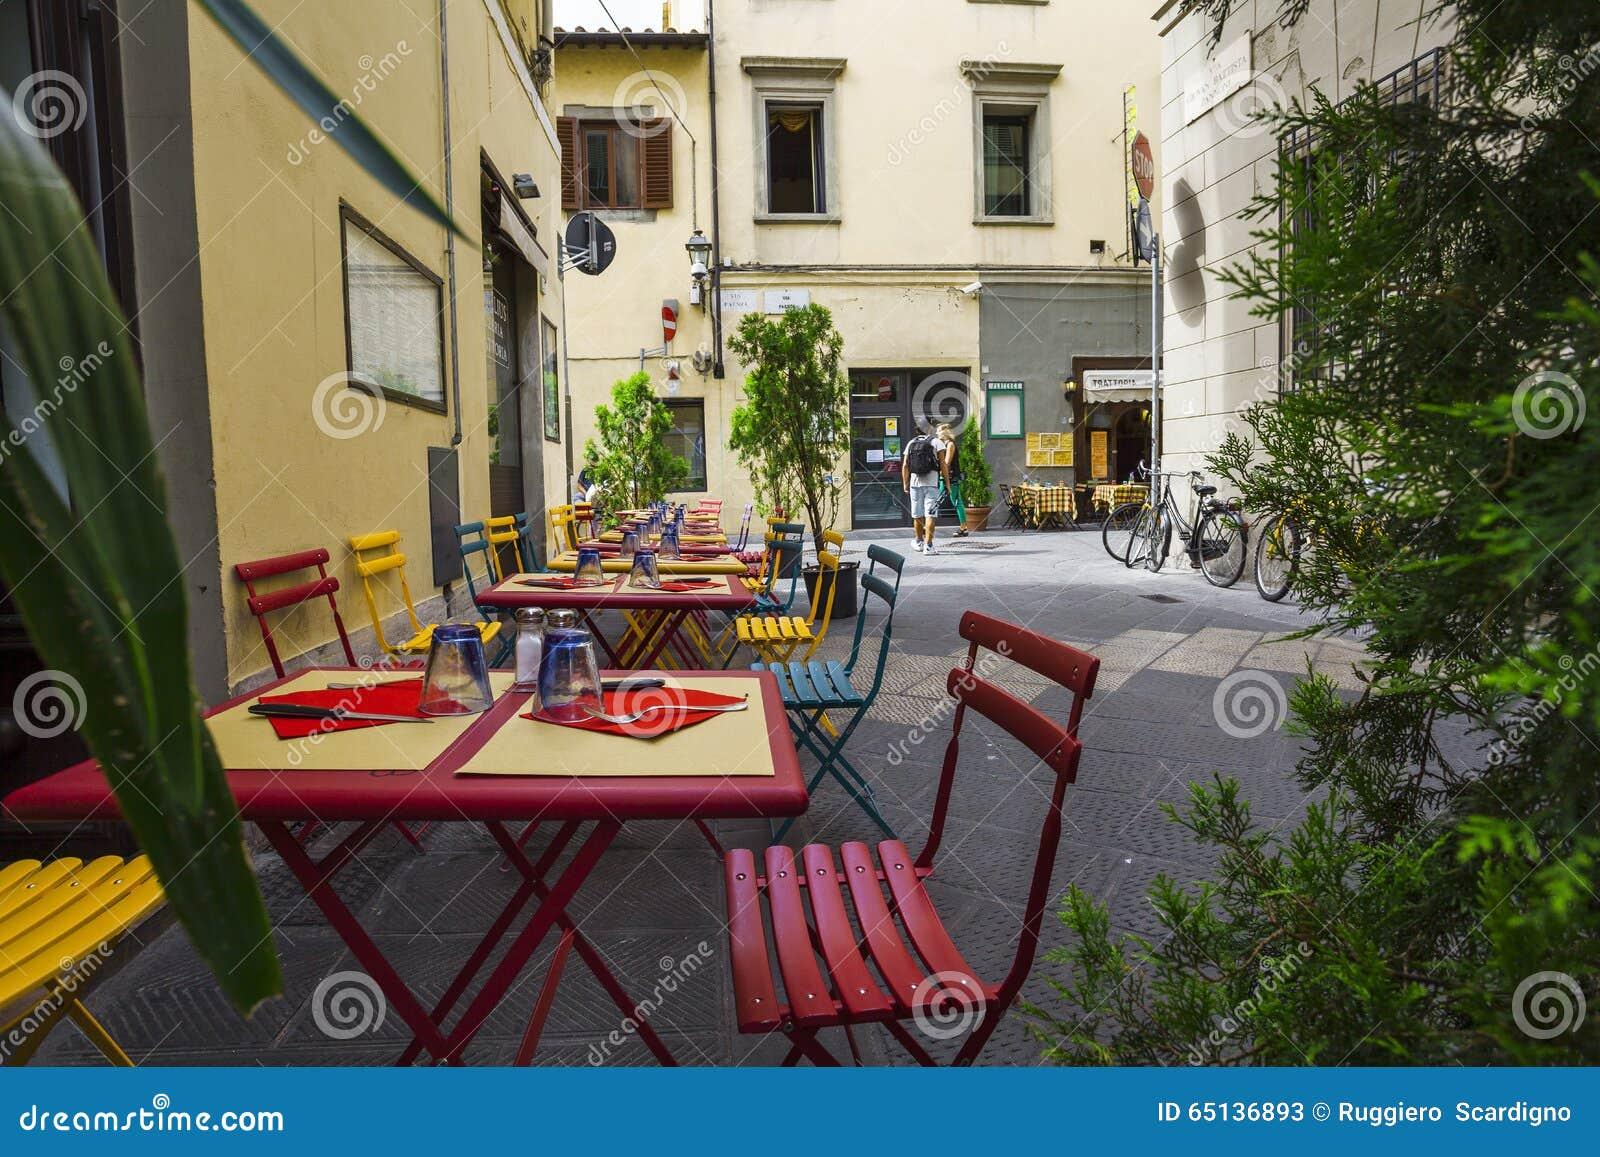 Italian restaurant,pizzeria and trattoria,Florence.Tuscany.